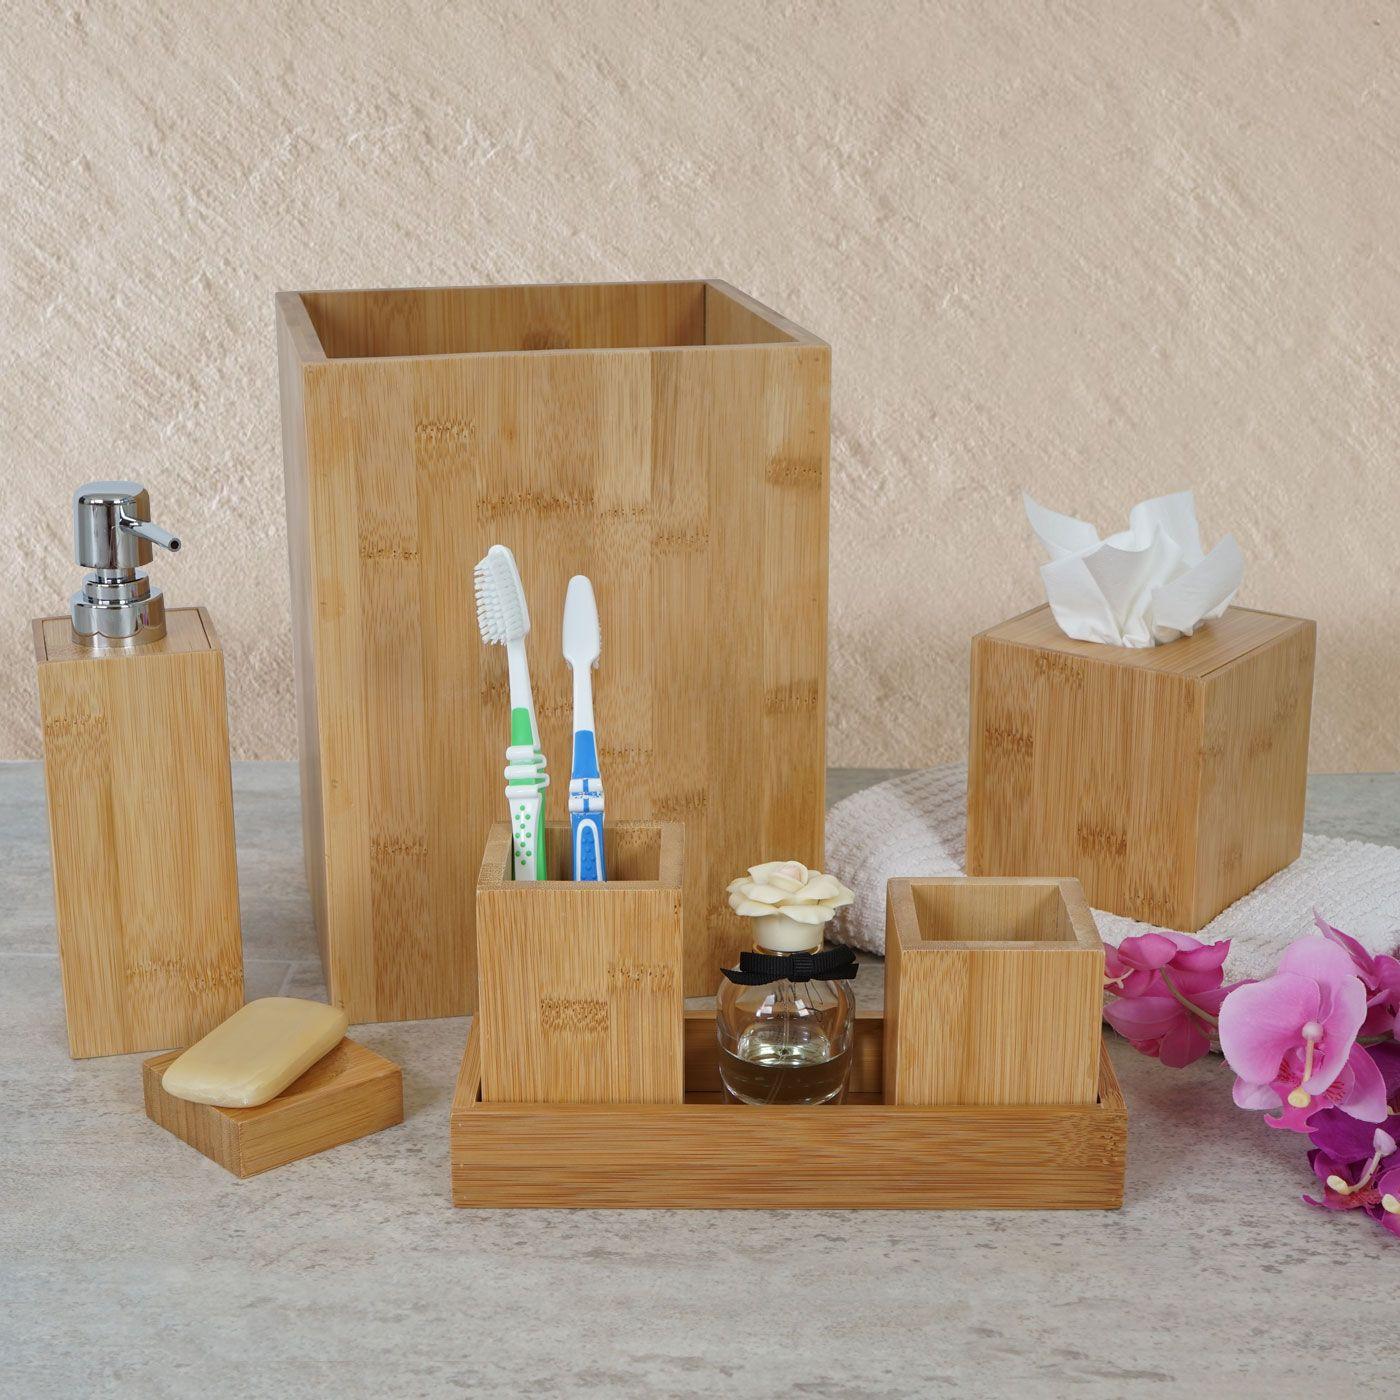 Holz Badezimmer Accessoires Home